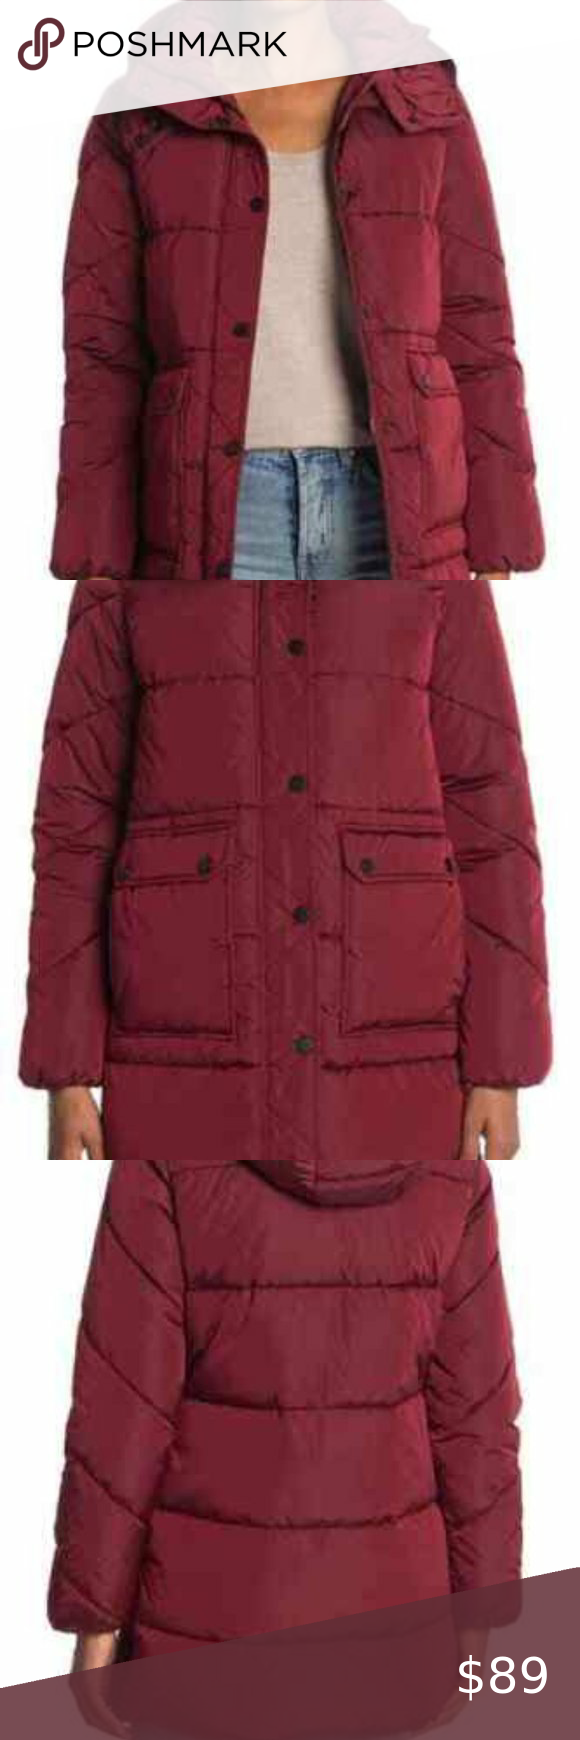 Nwt Lucky Brand Hooded Puffer Jacket Coat Hw9190 Red Puffer Jacket Puffer Jacket Women Olive Green Bomber Jacket [ 1740 x 580 Pixel ]